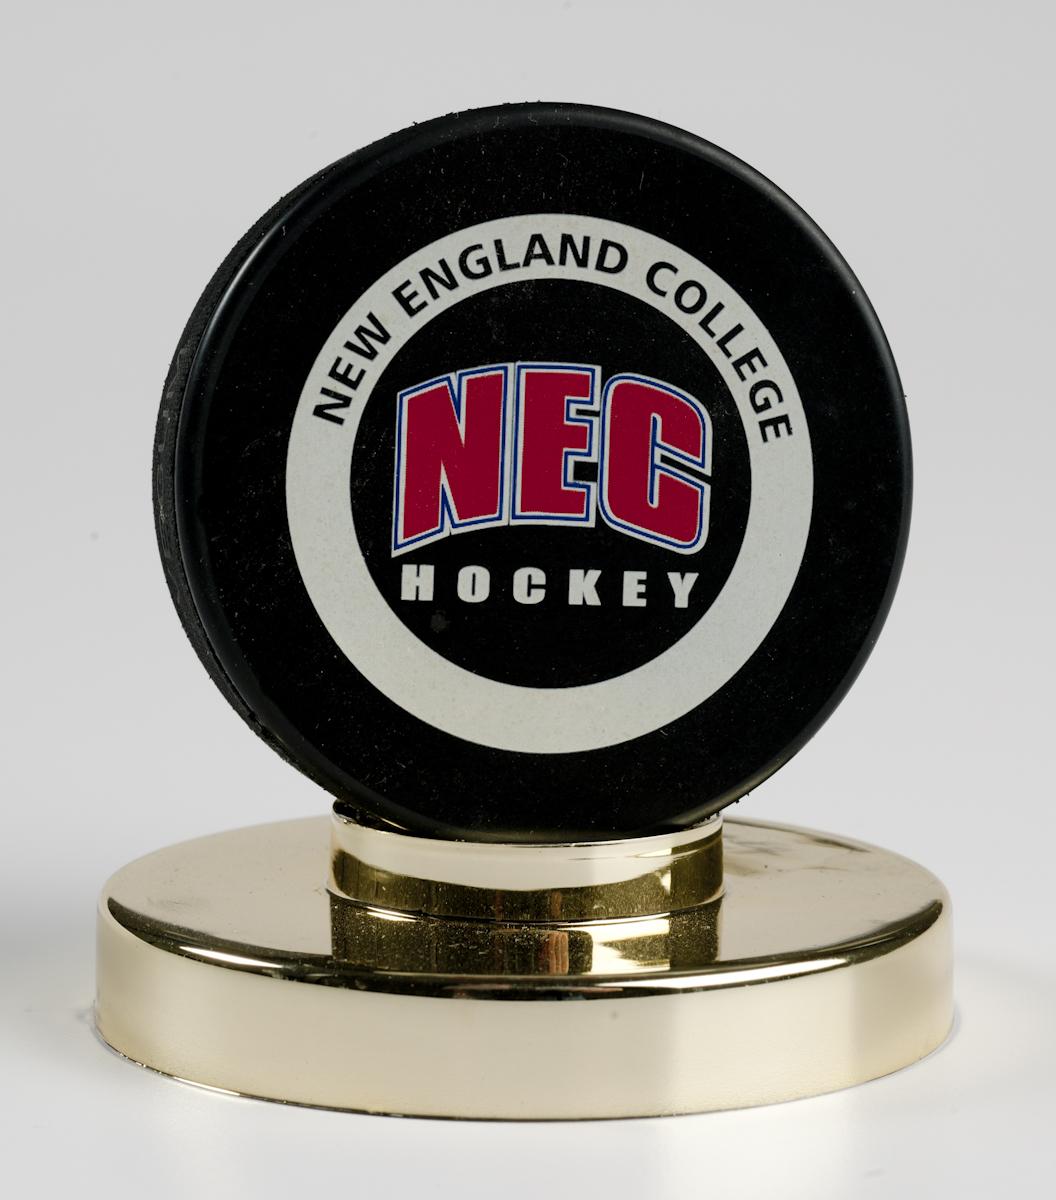 NEC hockey puck